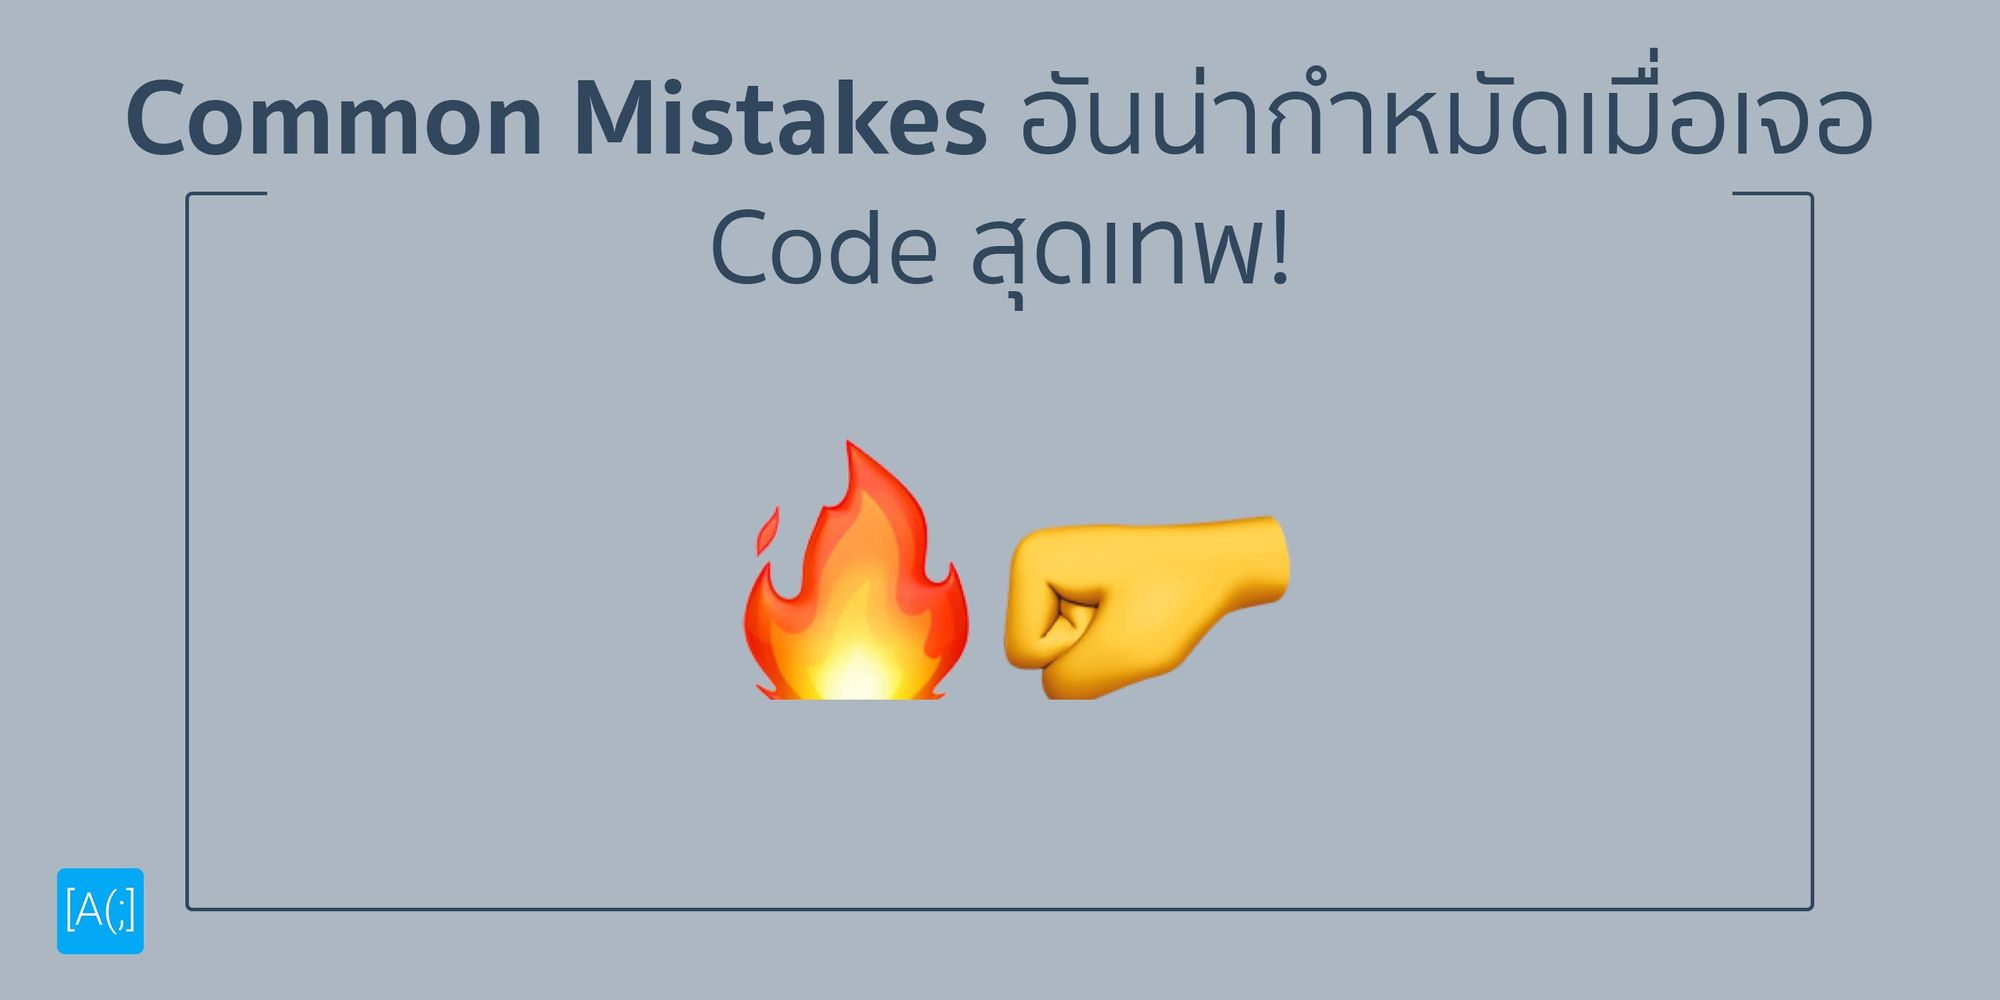 Common Mistakes อันน่ากำหมัดเมื่อเจอ Code สุดเทพ!